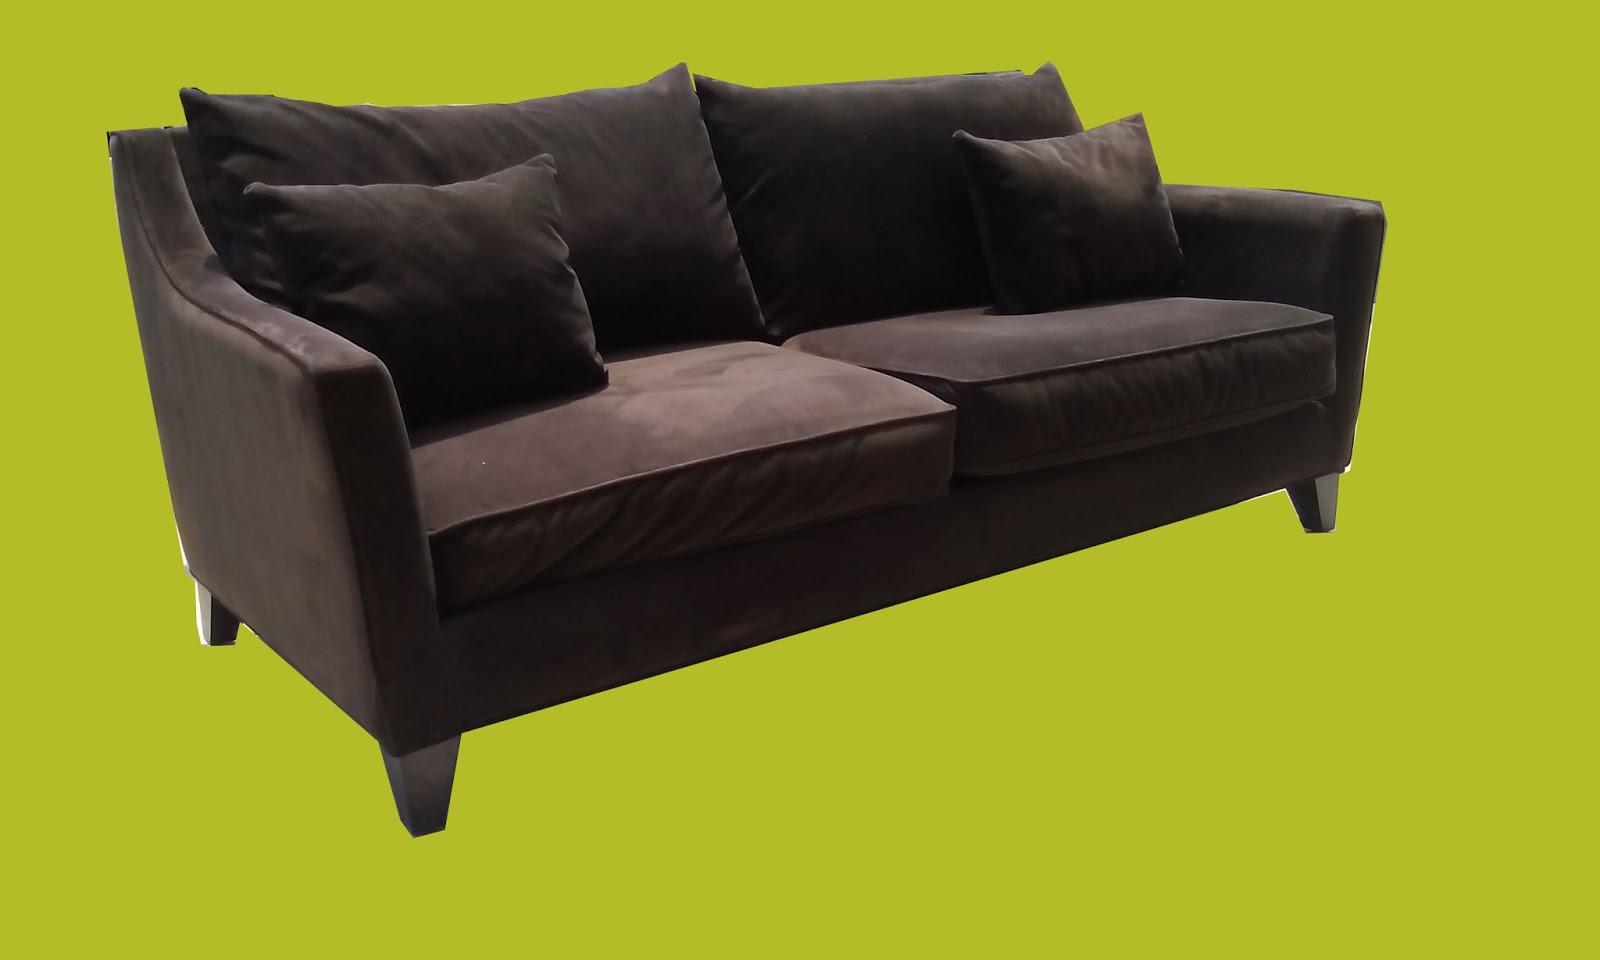 uhuru furniture collectibles chocolate velour sofa